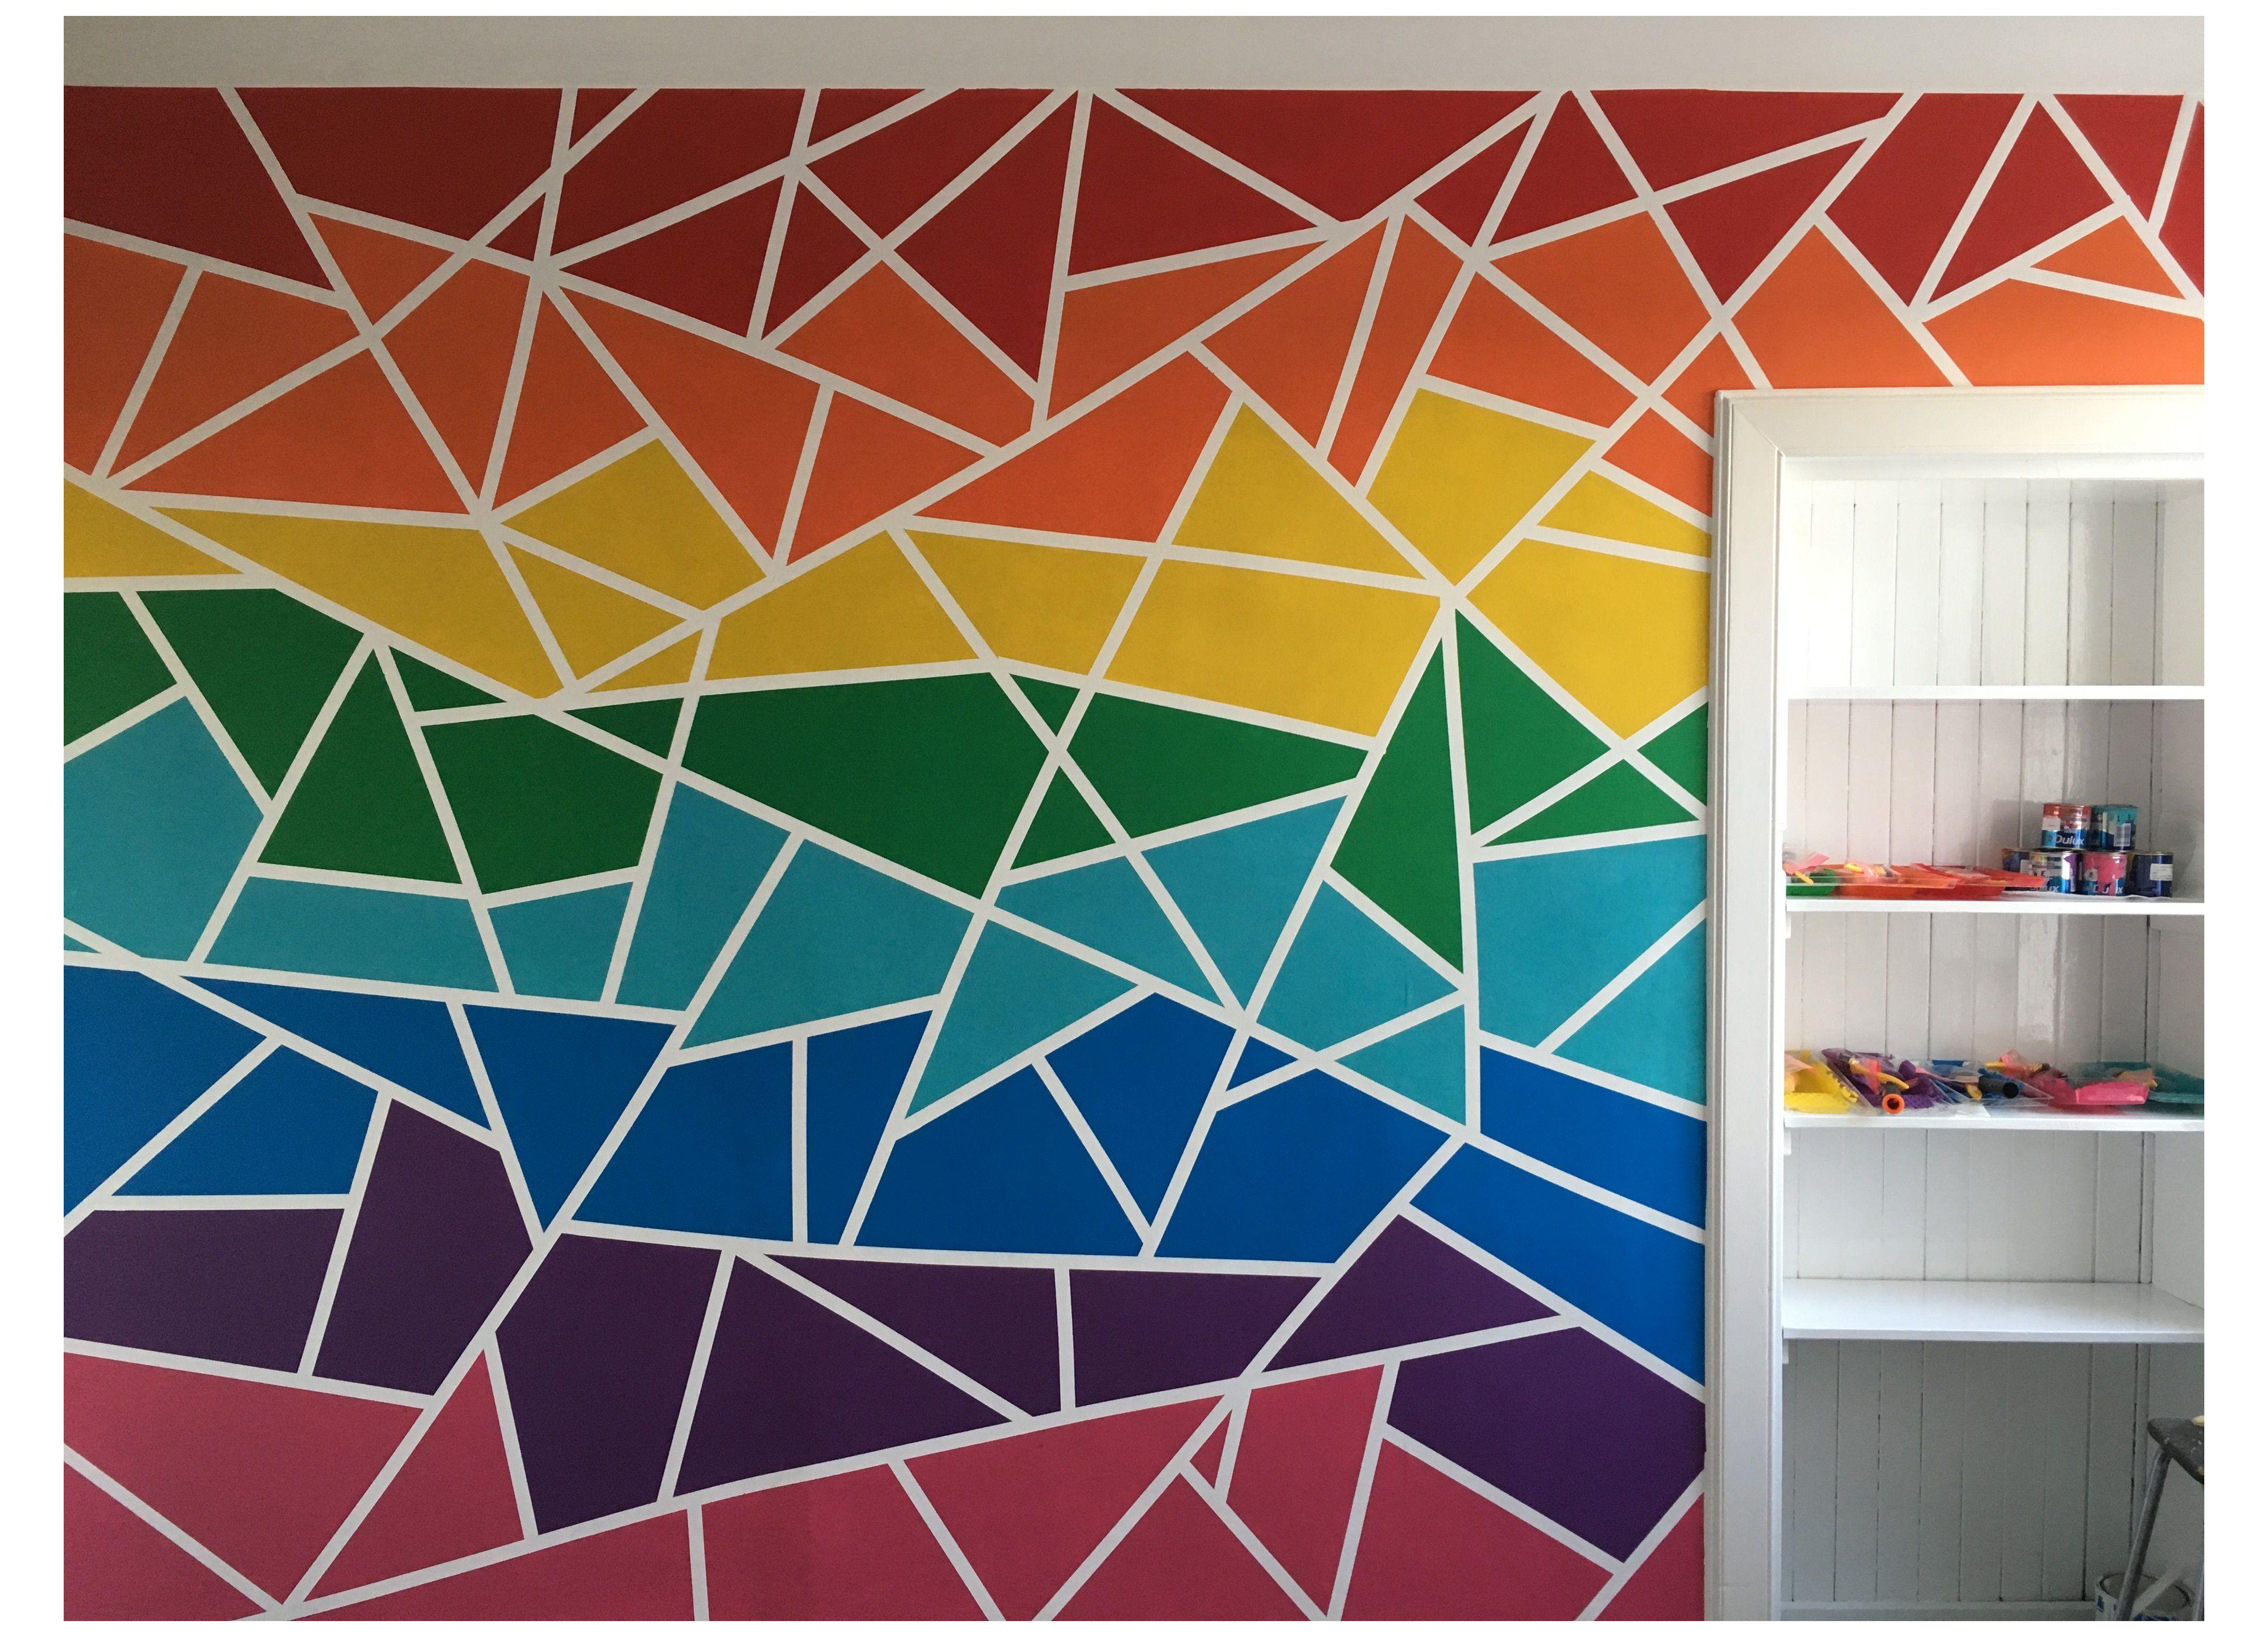 Geometric Wall Paint Rainbow Geometricwallpaintrainbow Rainbow Geometric Wall In 2021 Diy Wall Painting Kids Room Wall Art Wall Paint Designs